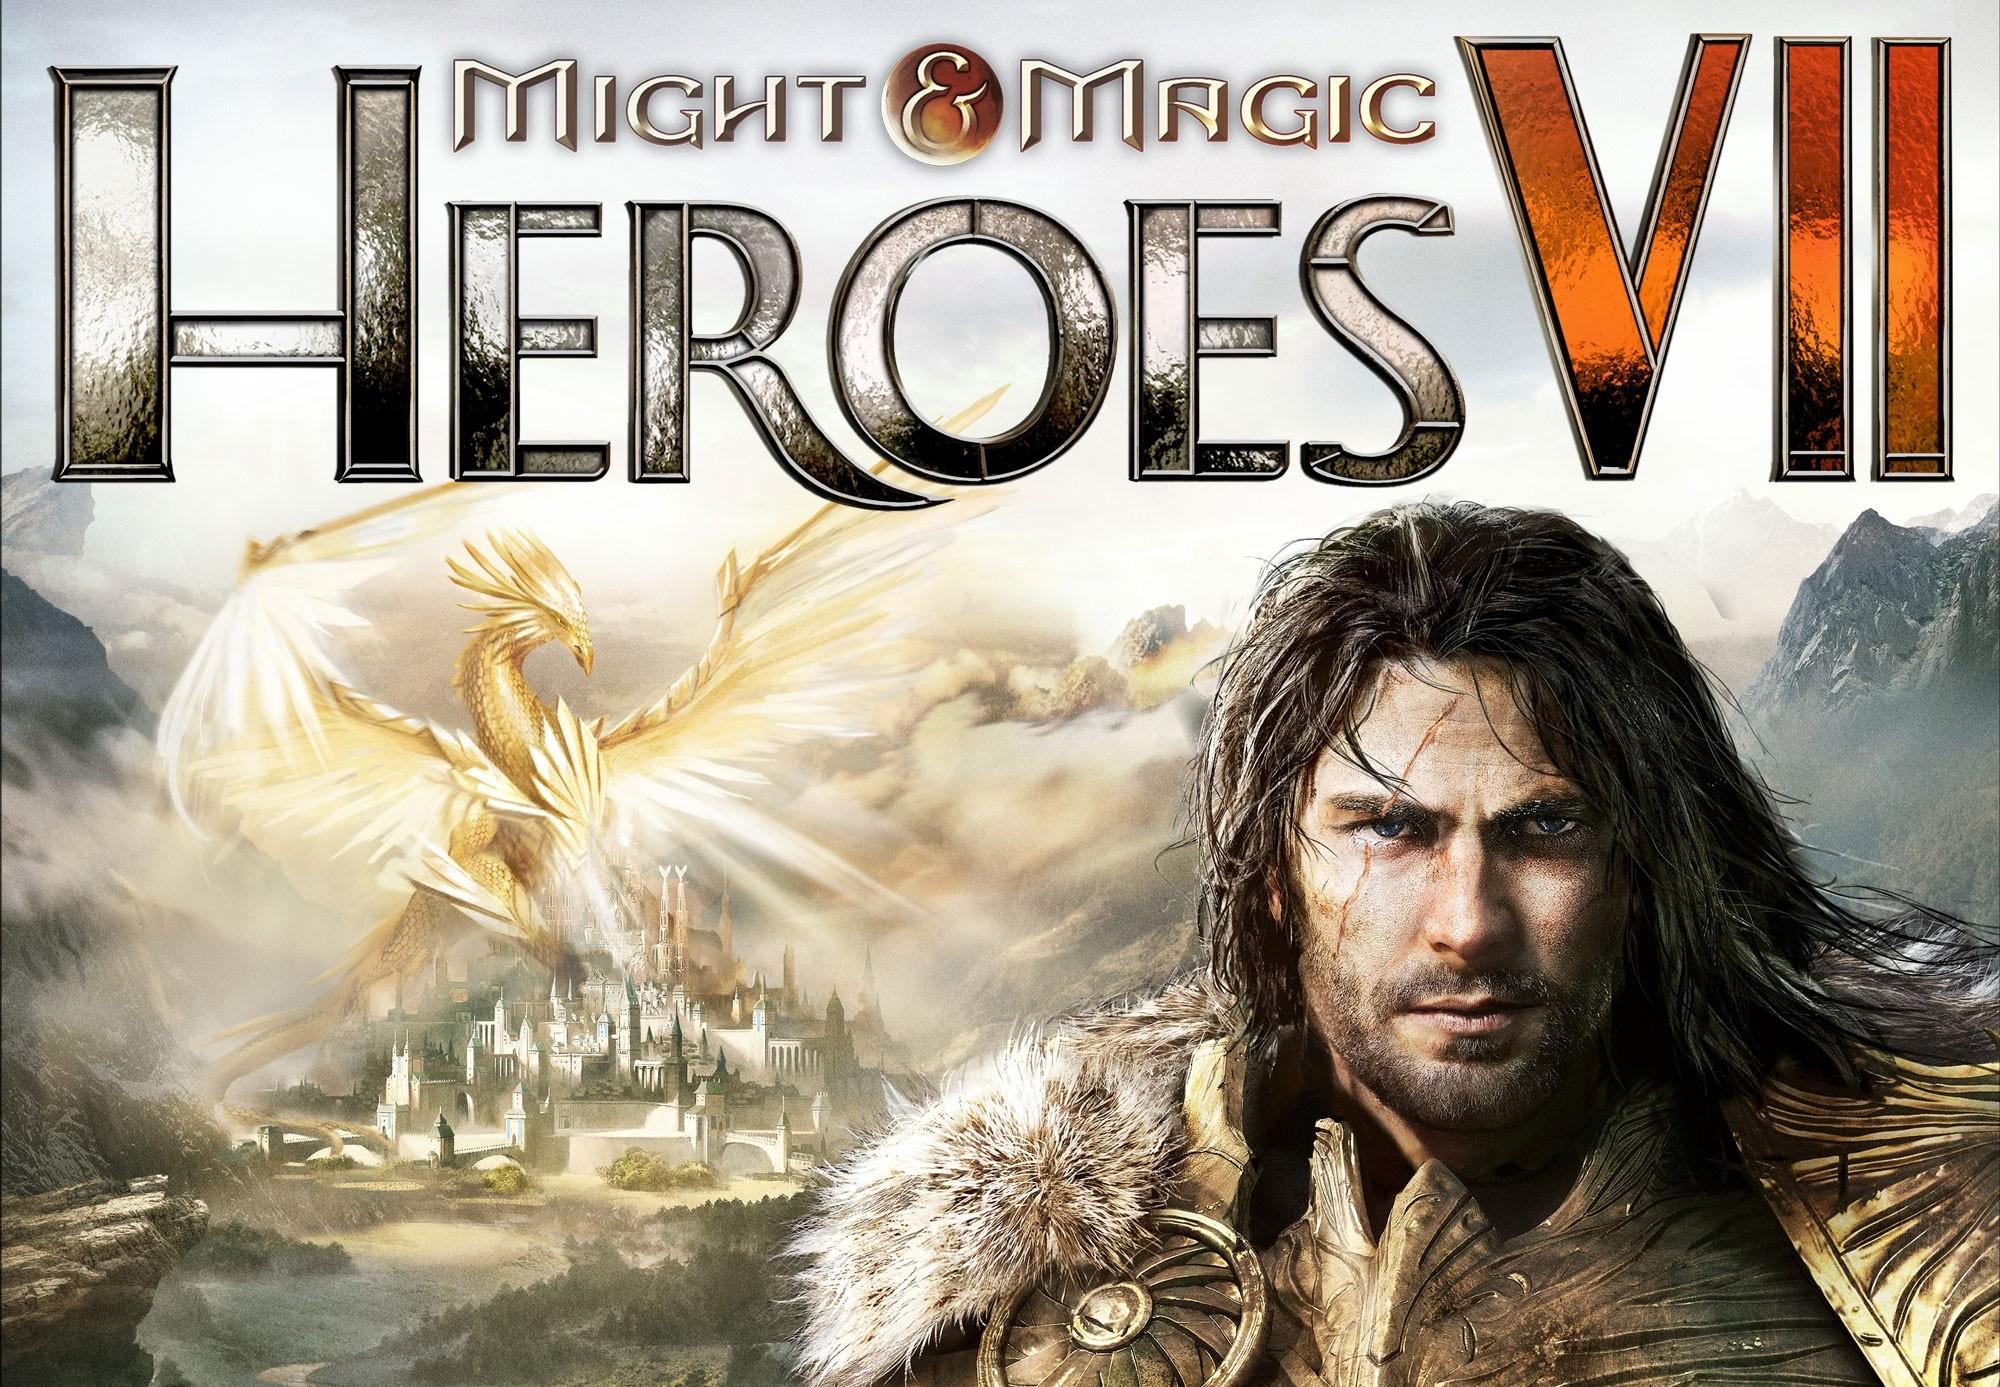 Might & Magic Heroes VII Full Pack Uplay CD Key